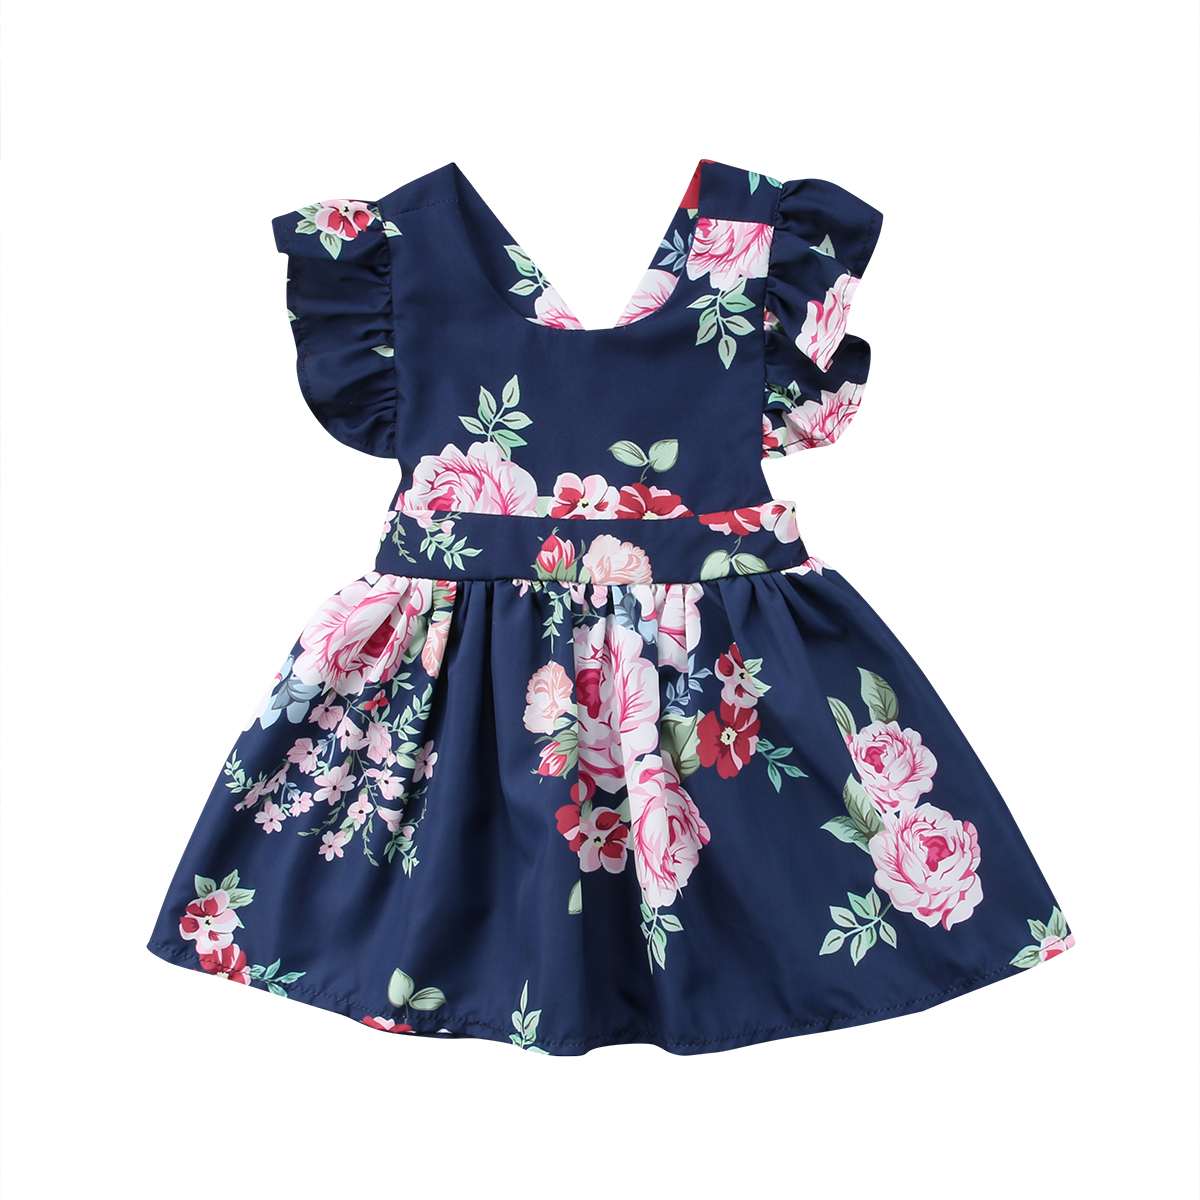 flower dresses toddler girl clothes girls navy floral dress